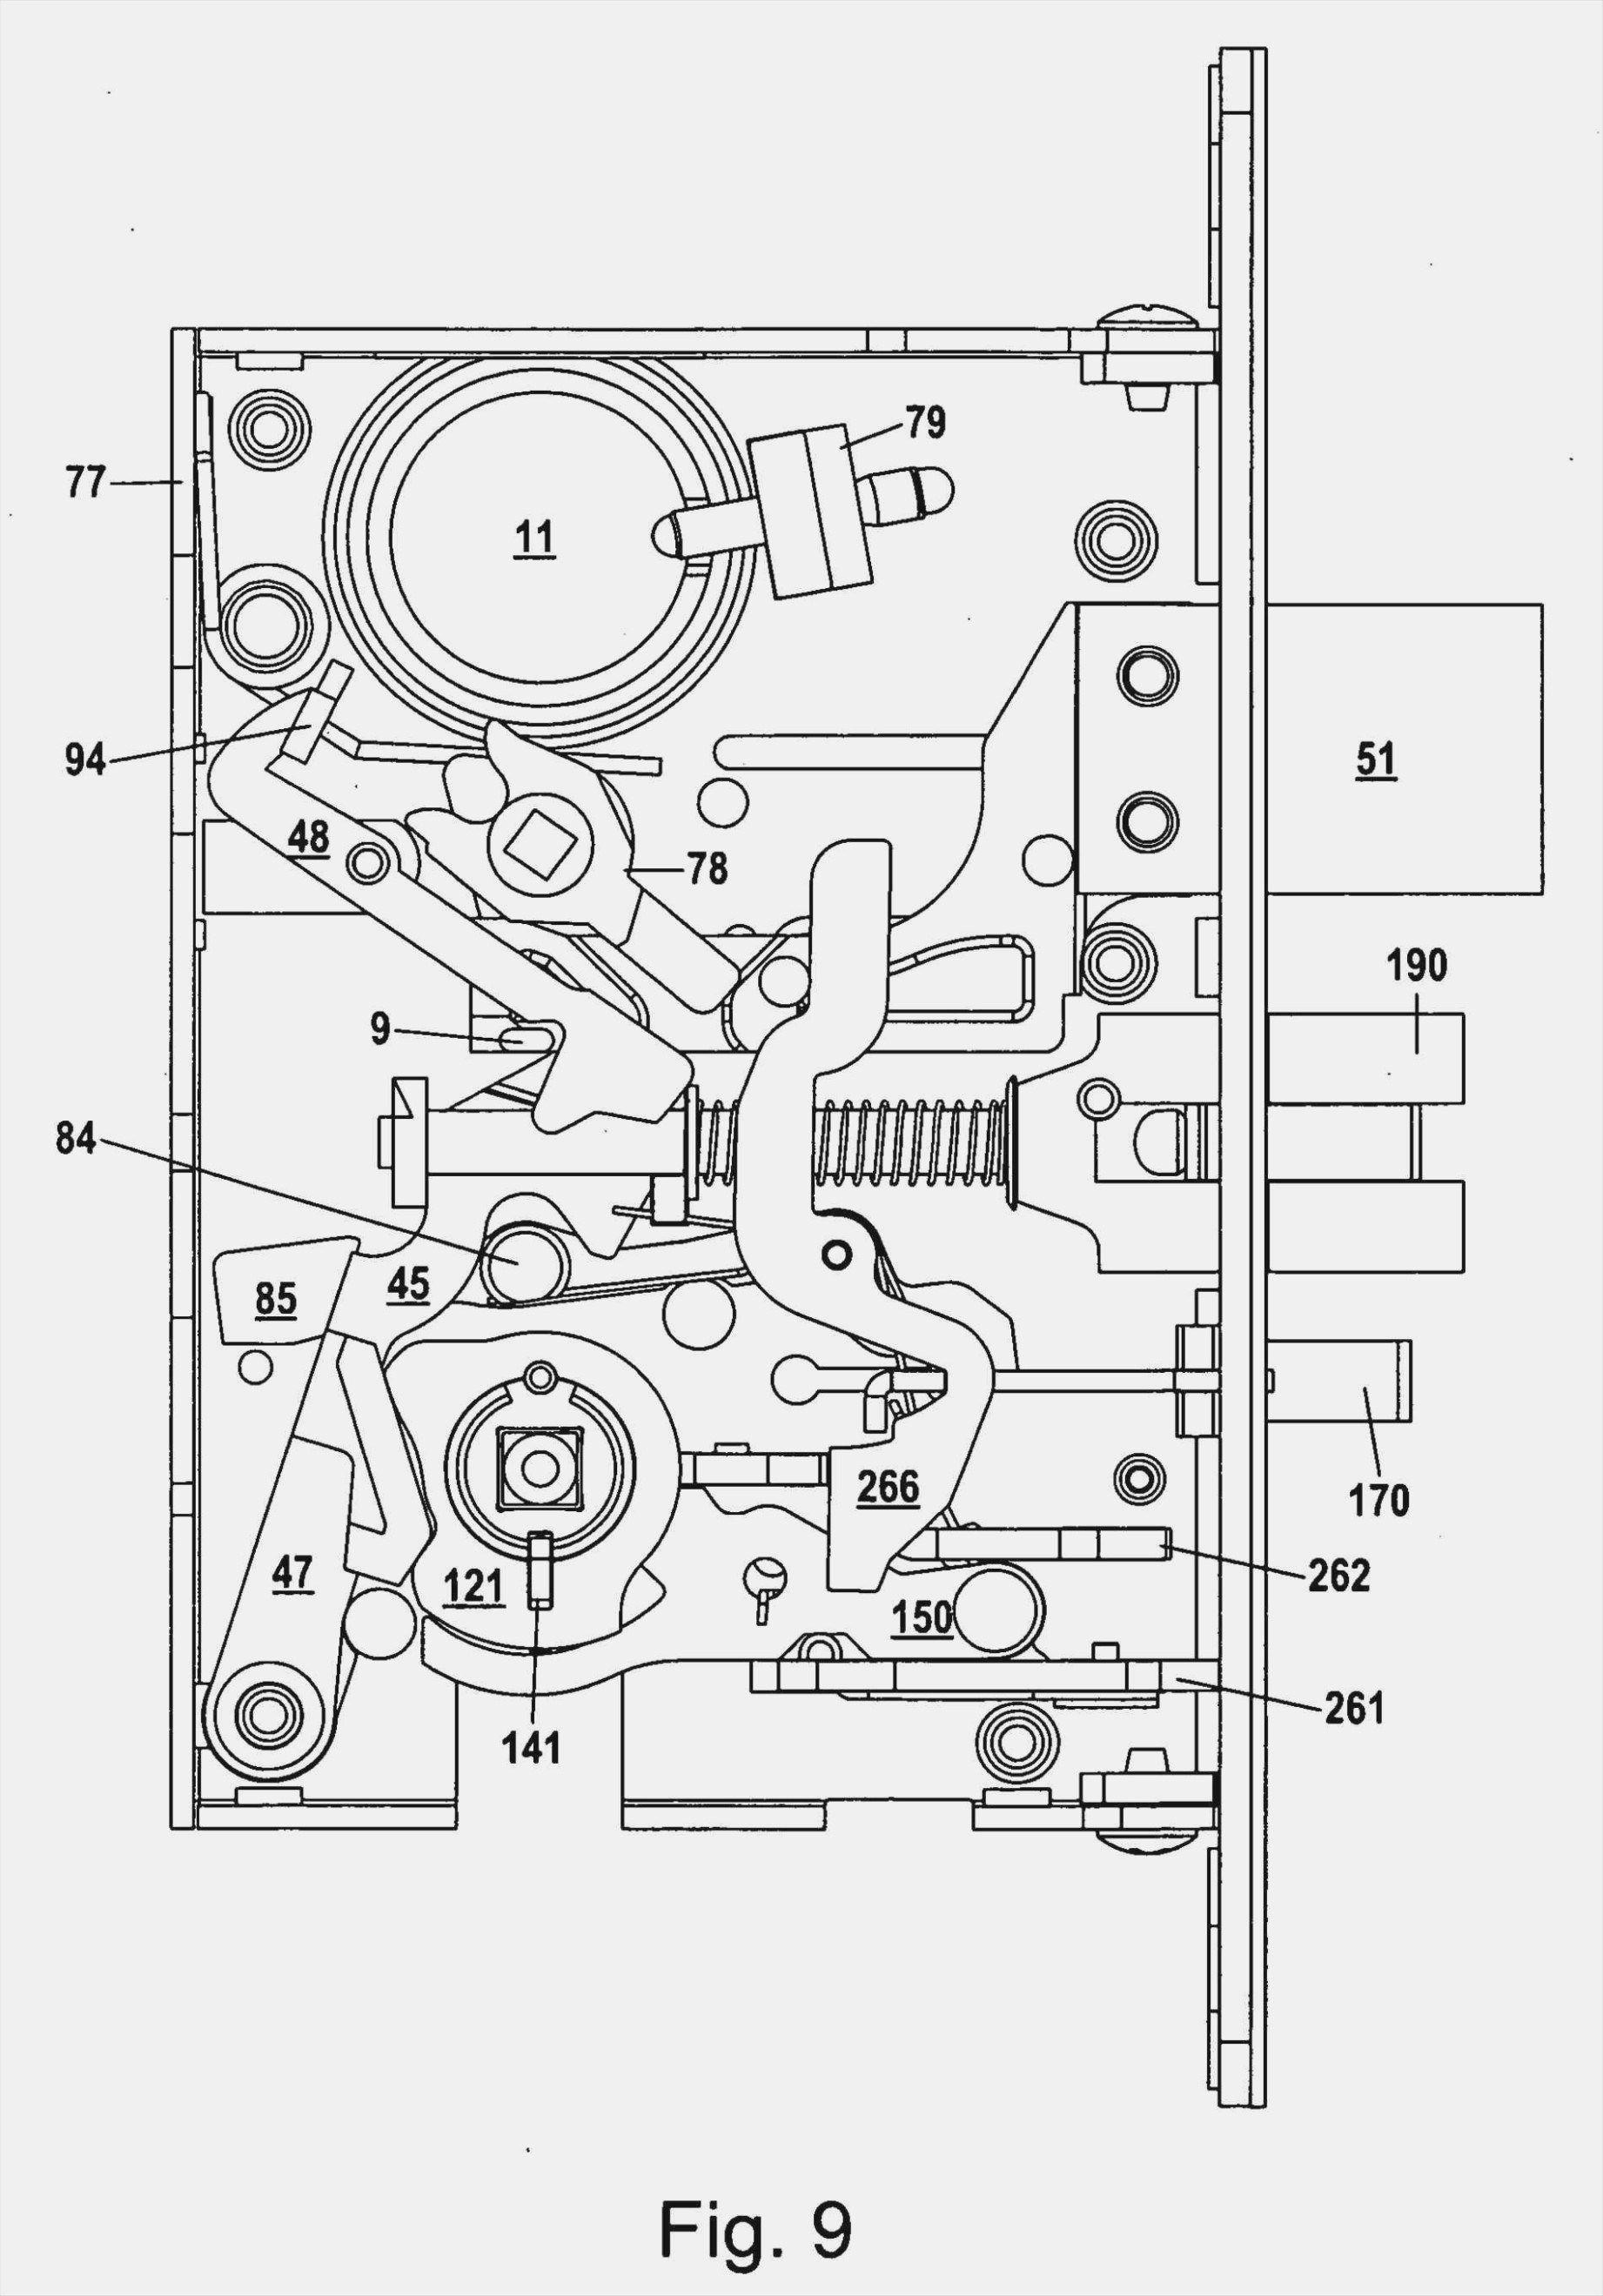 medium resolution of schlage mortise lock parts diagram wiring diagram yer yale 8000 mortise lock parts diagram